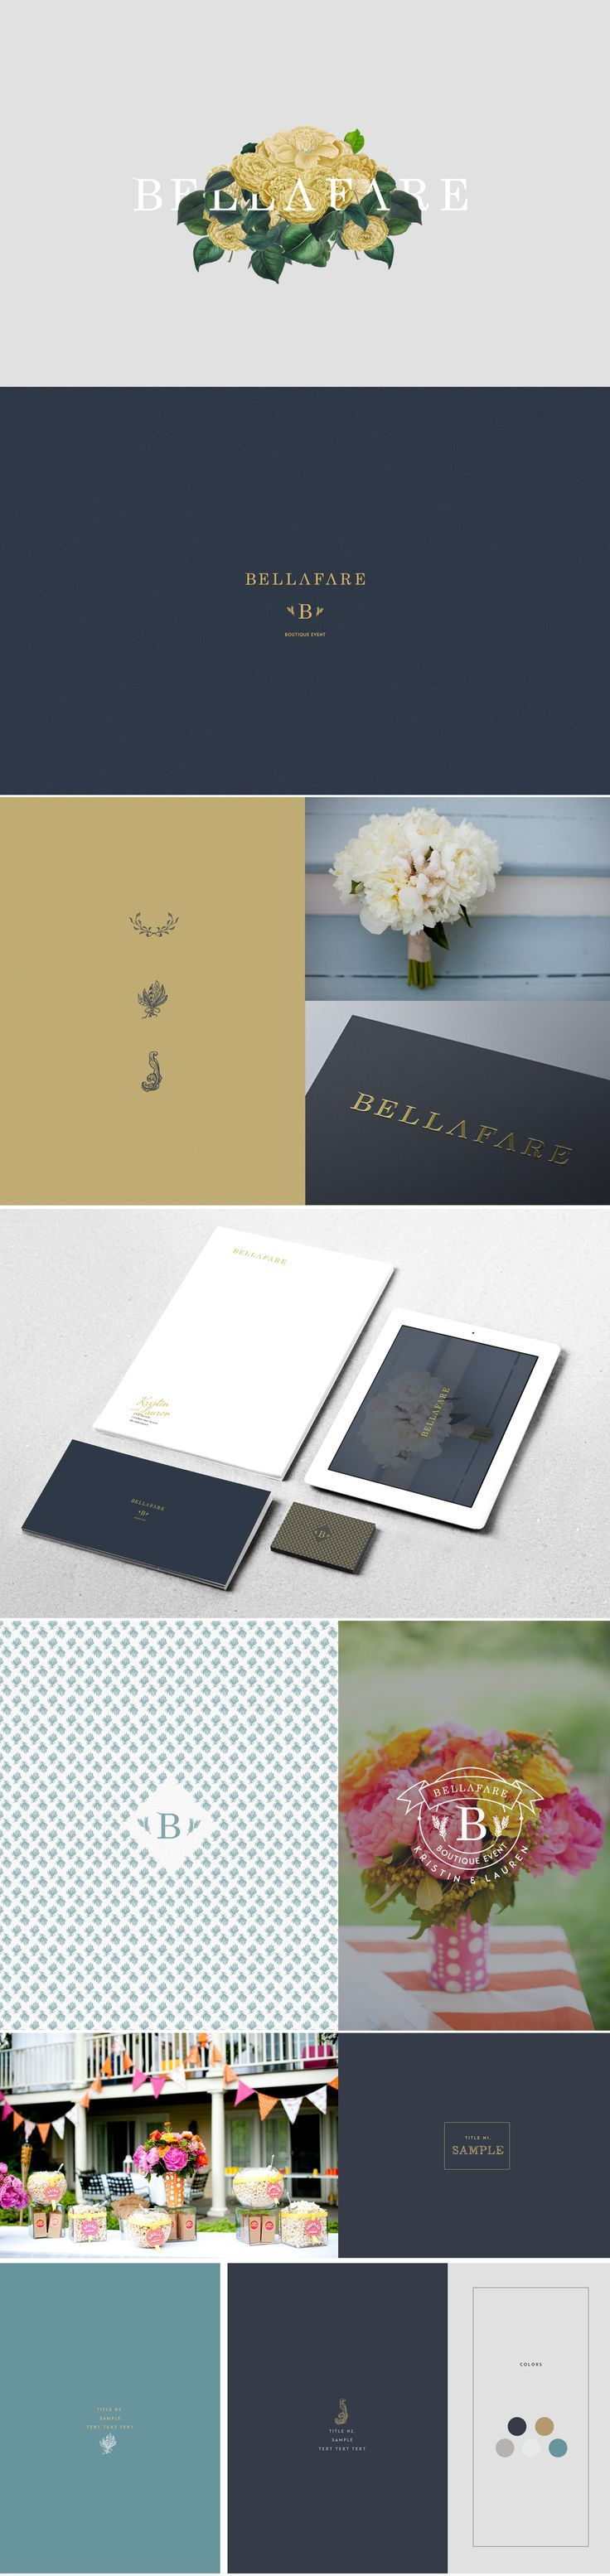 Brand Identity for Bellafare http://bellafare.com #design #branding #flosites…